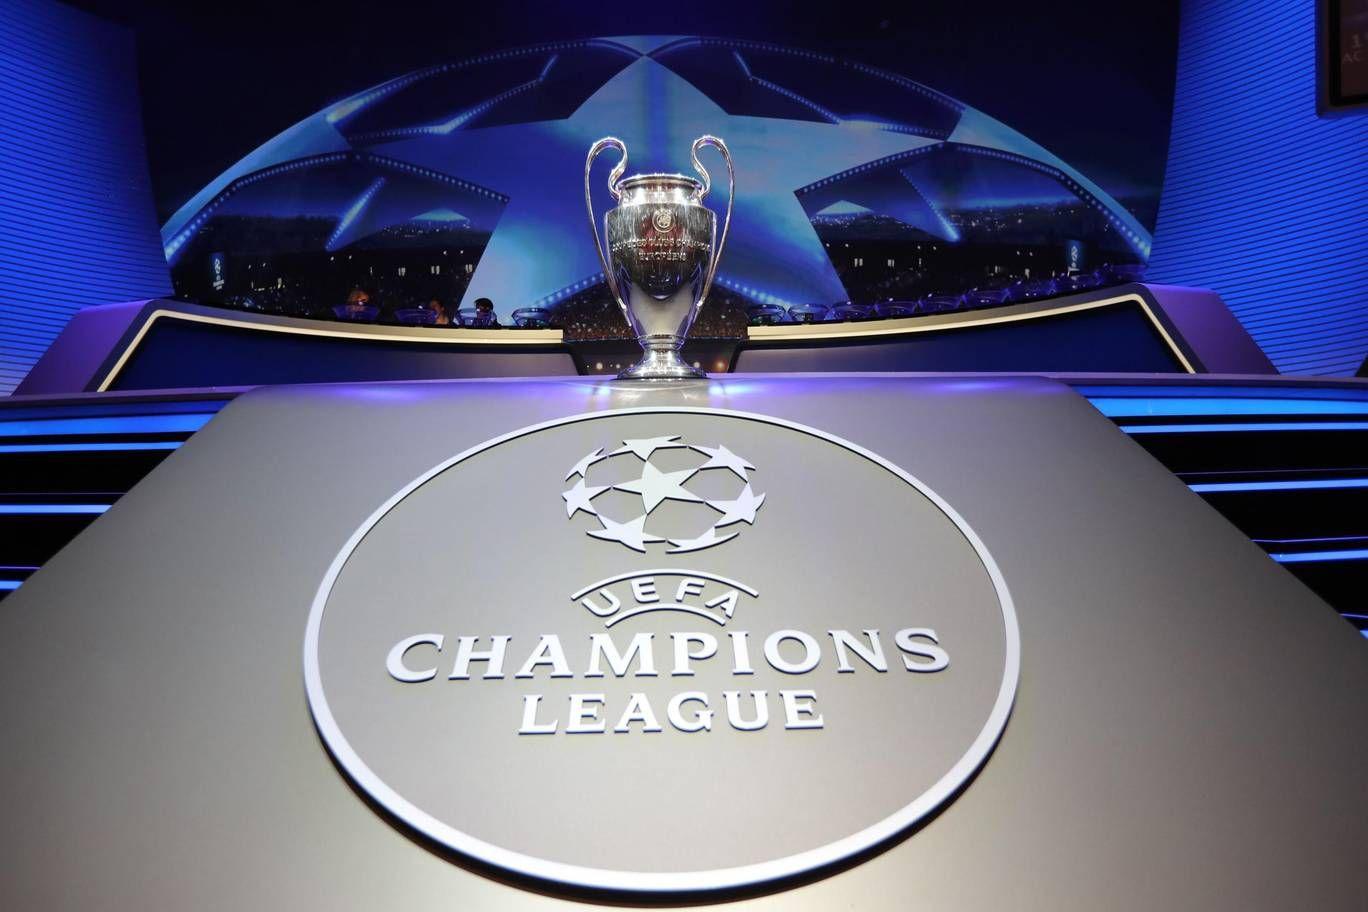 Manchester United Vs Psg Us Tv Channel